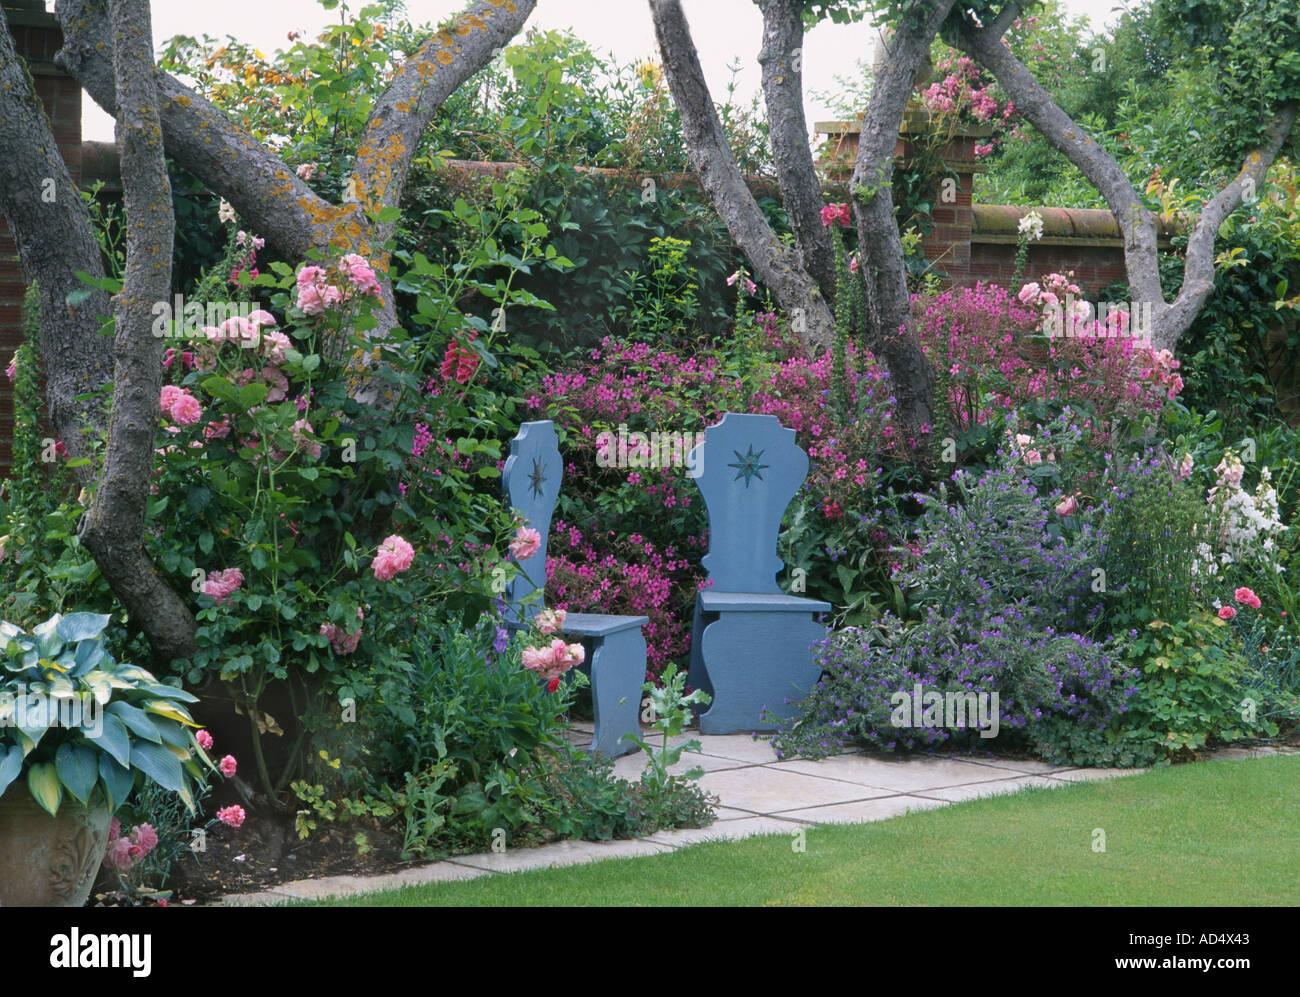 Garden Design New England cambridges anna mcarthur winning garden design at the east of